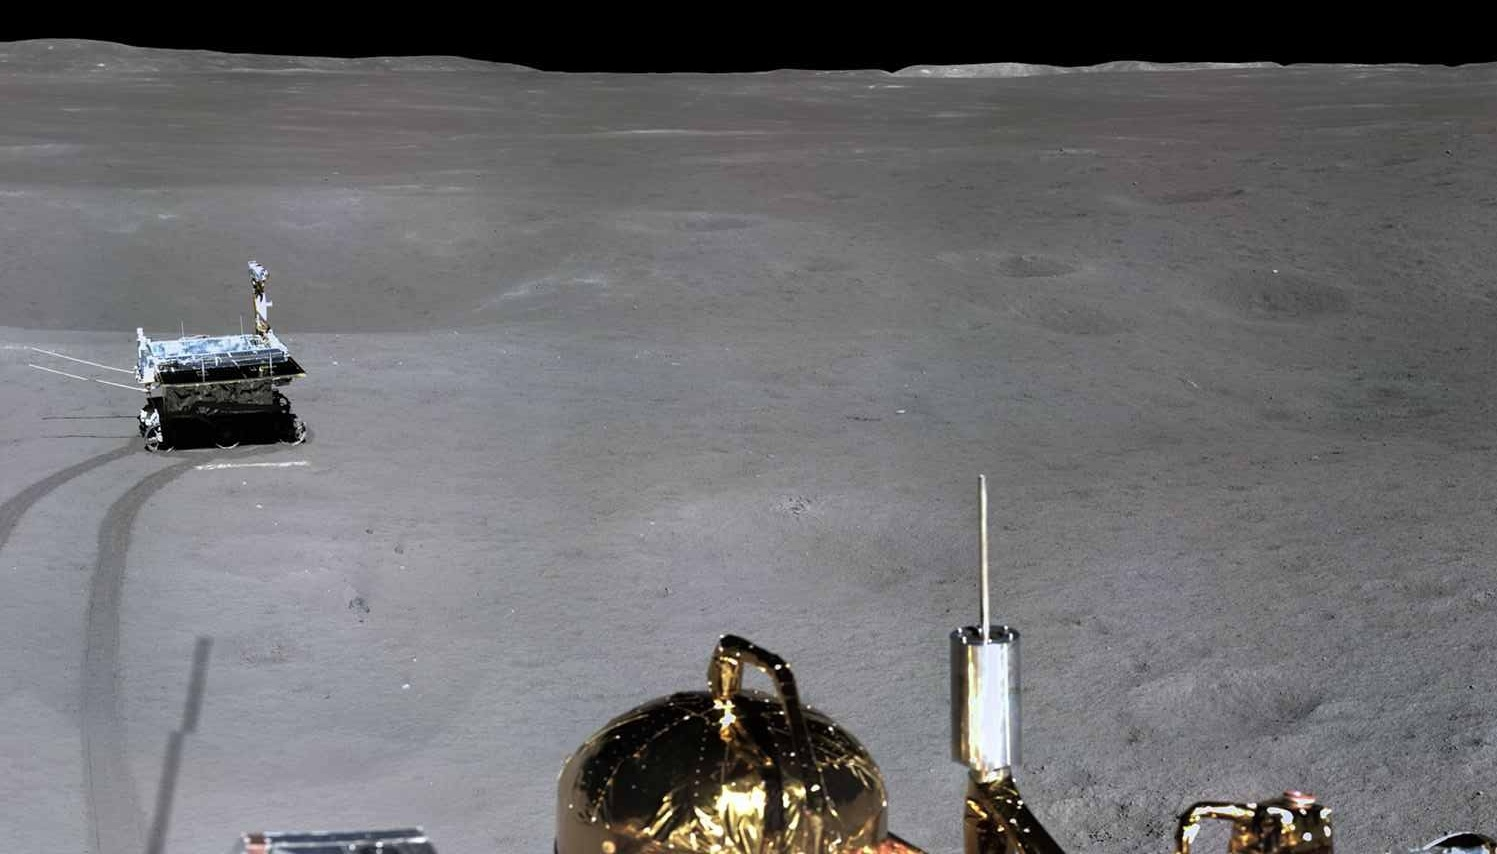 Миссия «Чанъэ-4» — третий лунный день. Ровер «Юйту-2» в поисках… камней - 11